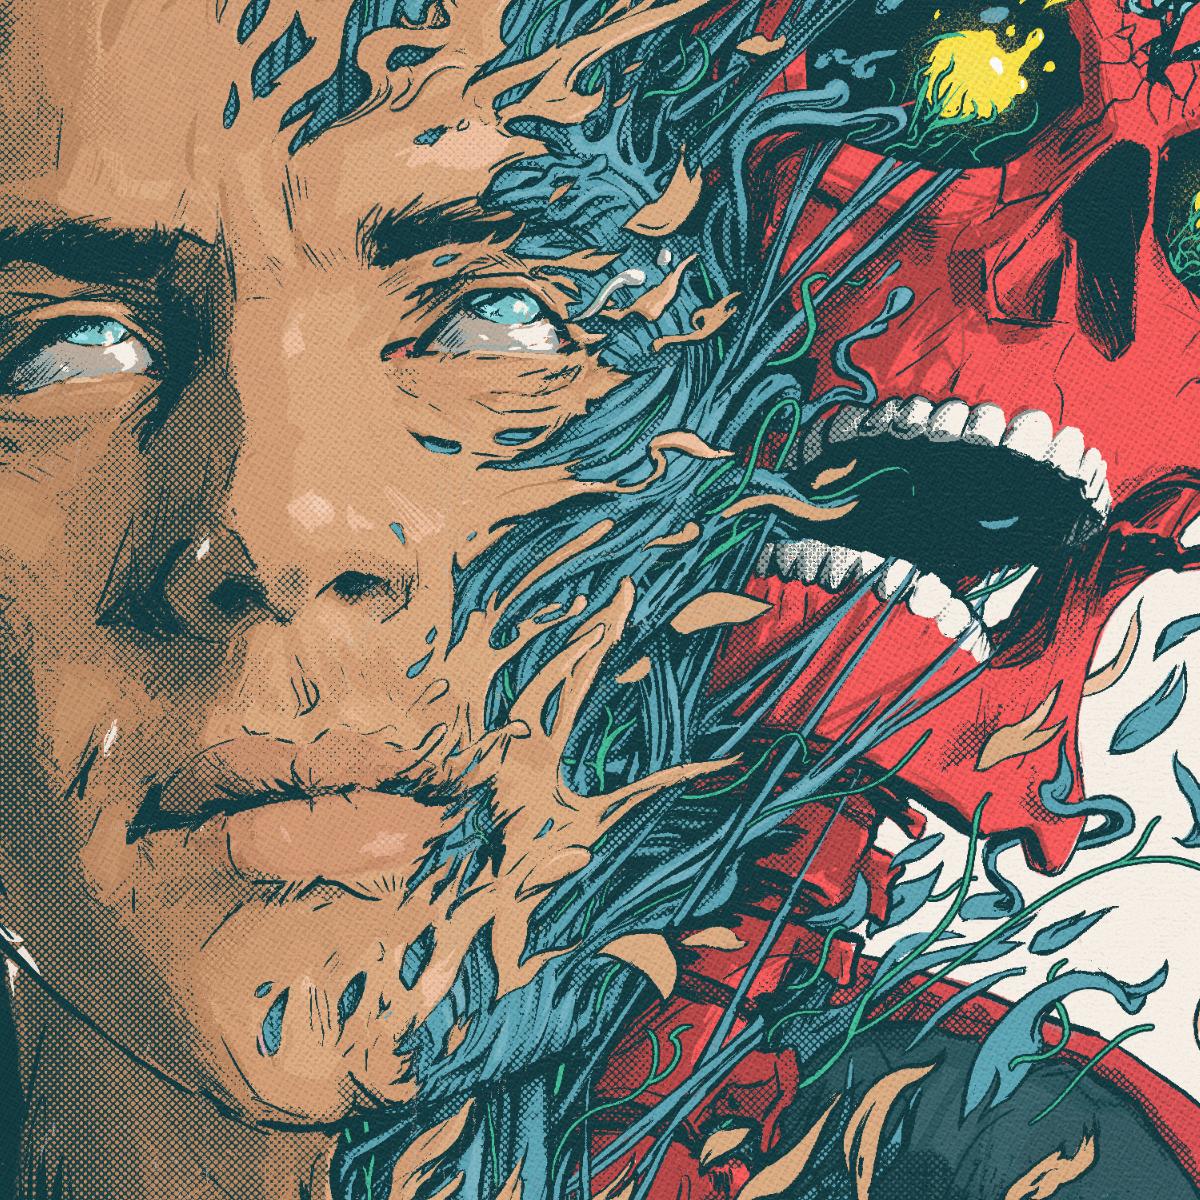 Confessions Of A Dangerous Mind Album Cover Sam Spratt